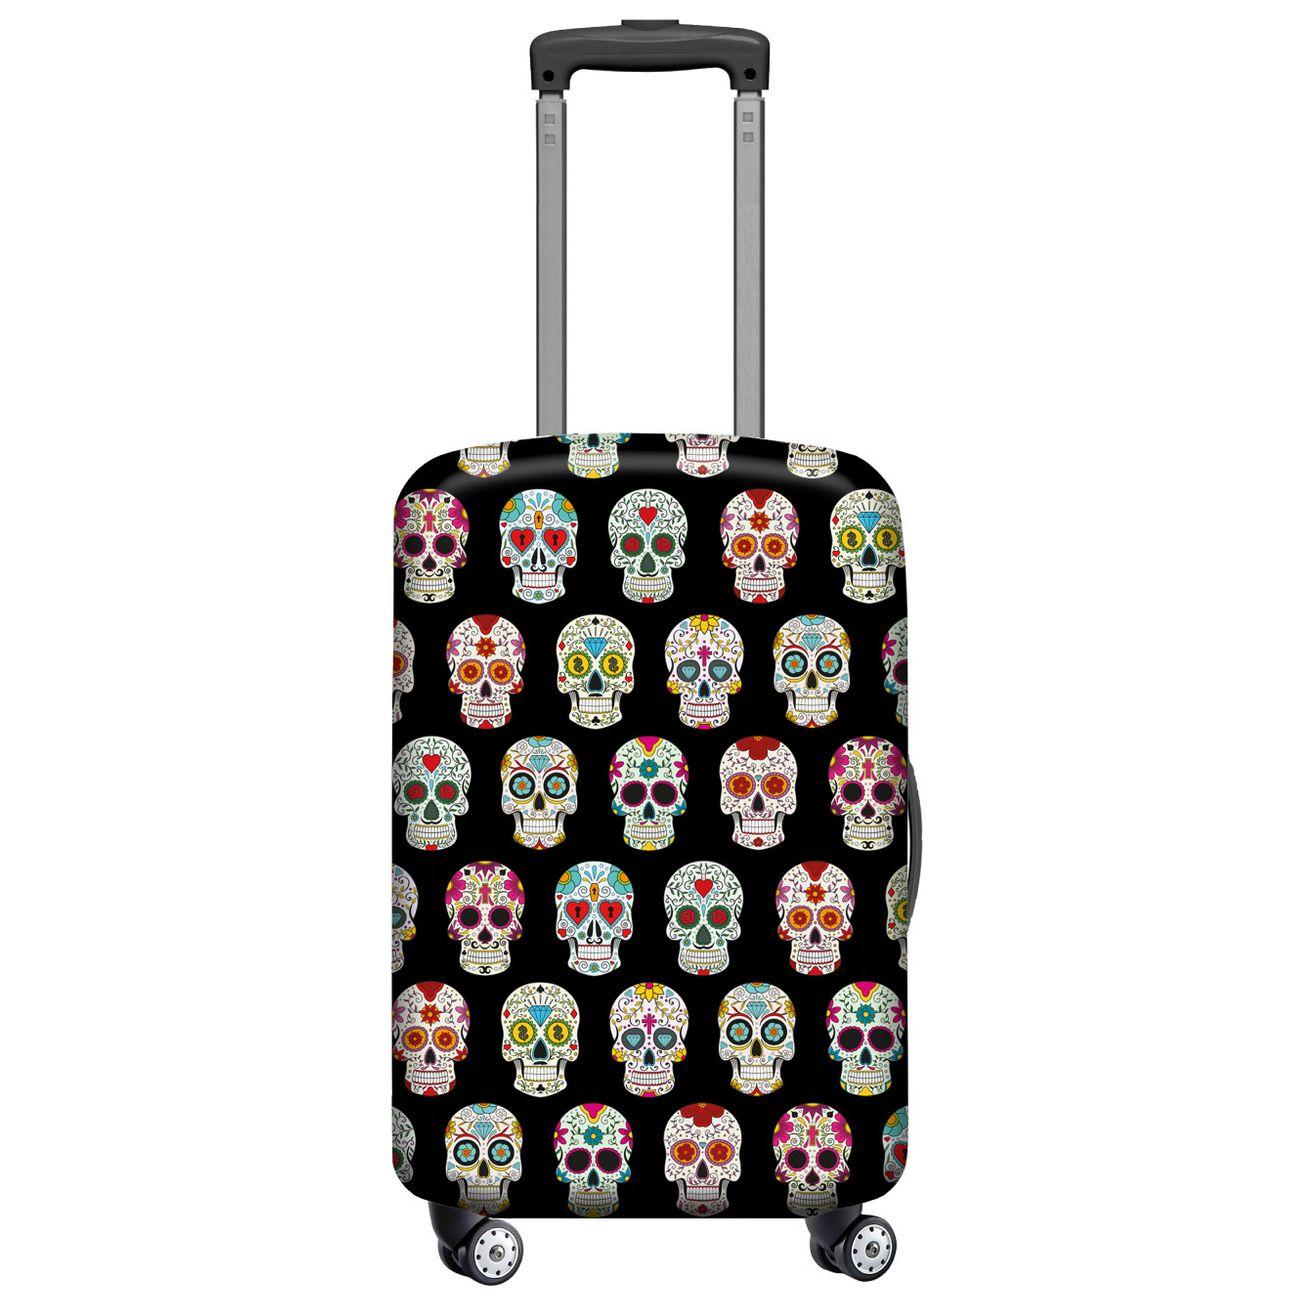 housse de valise bagage velosock mexico garde votre. Black Bedroom Furniture Sets. Home Design Ideas